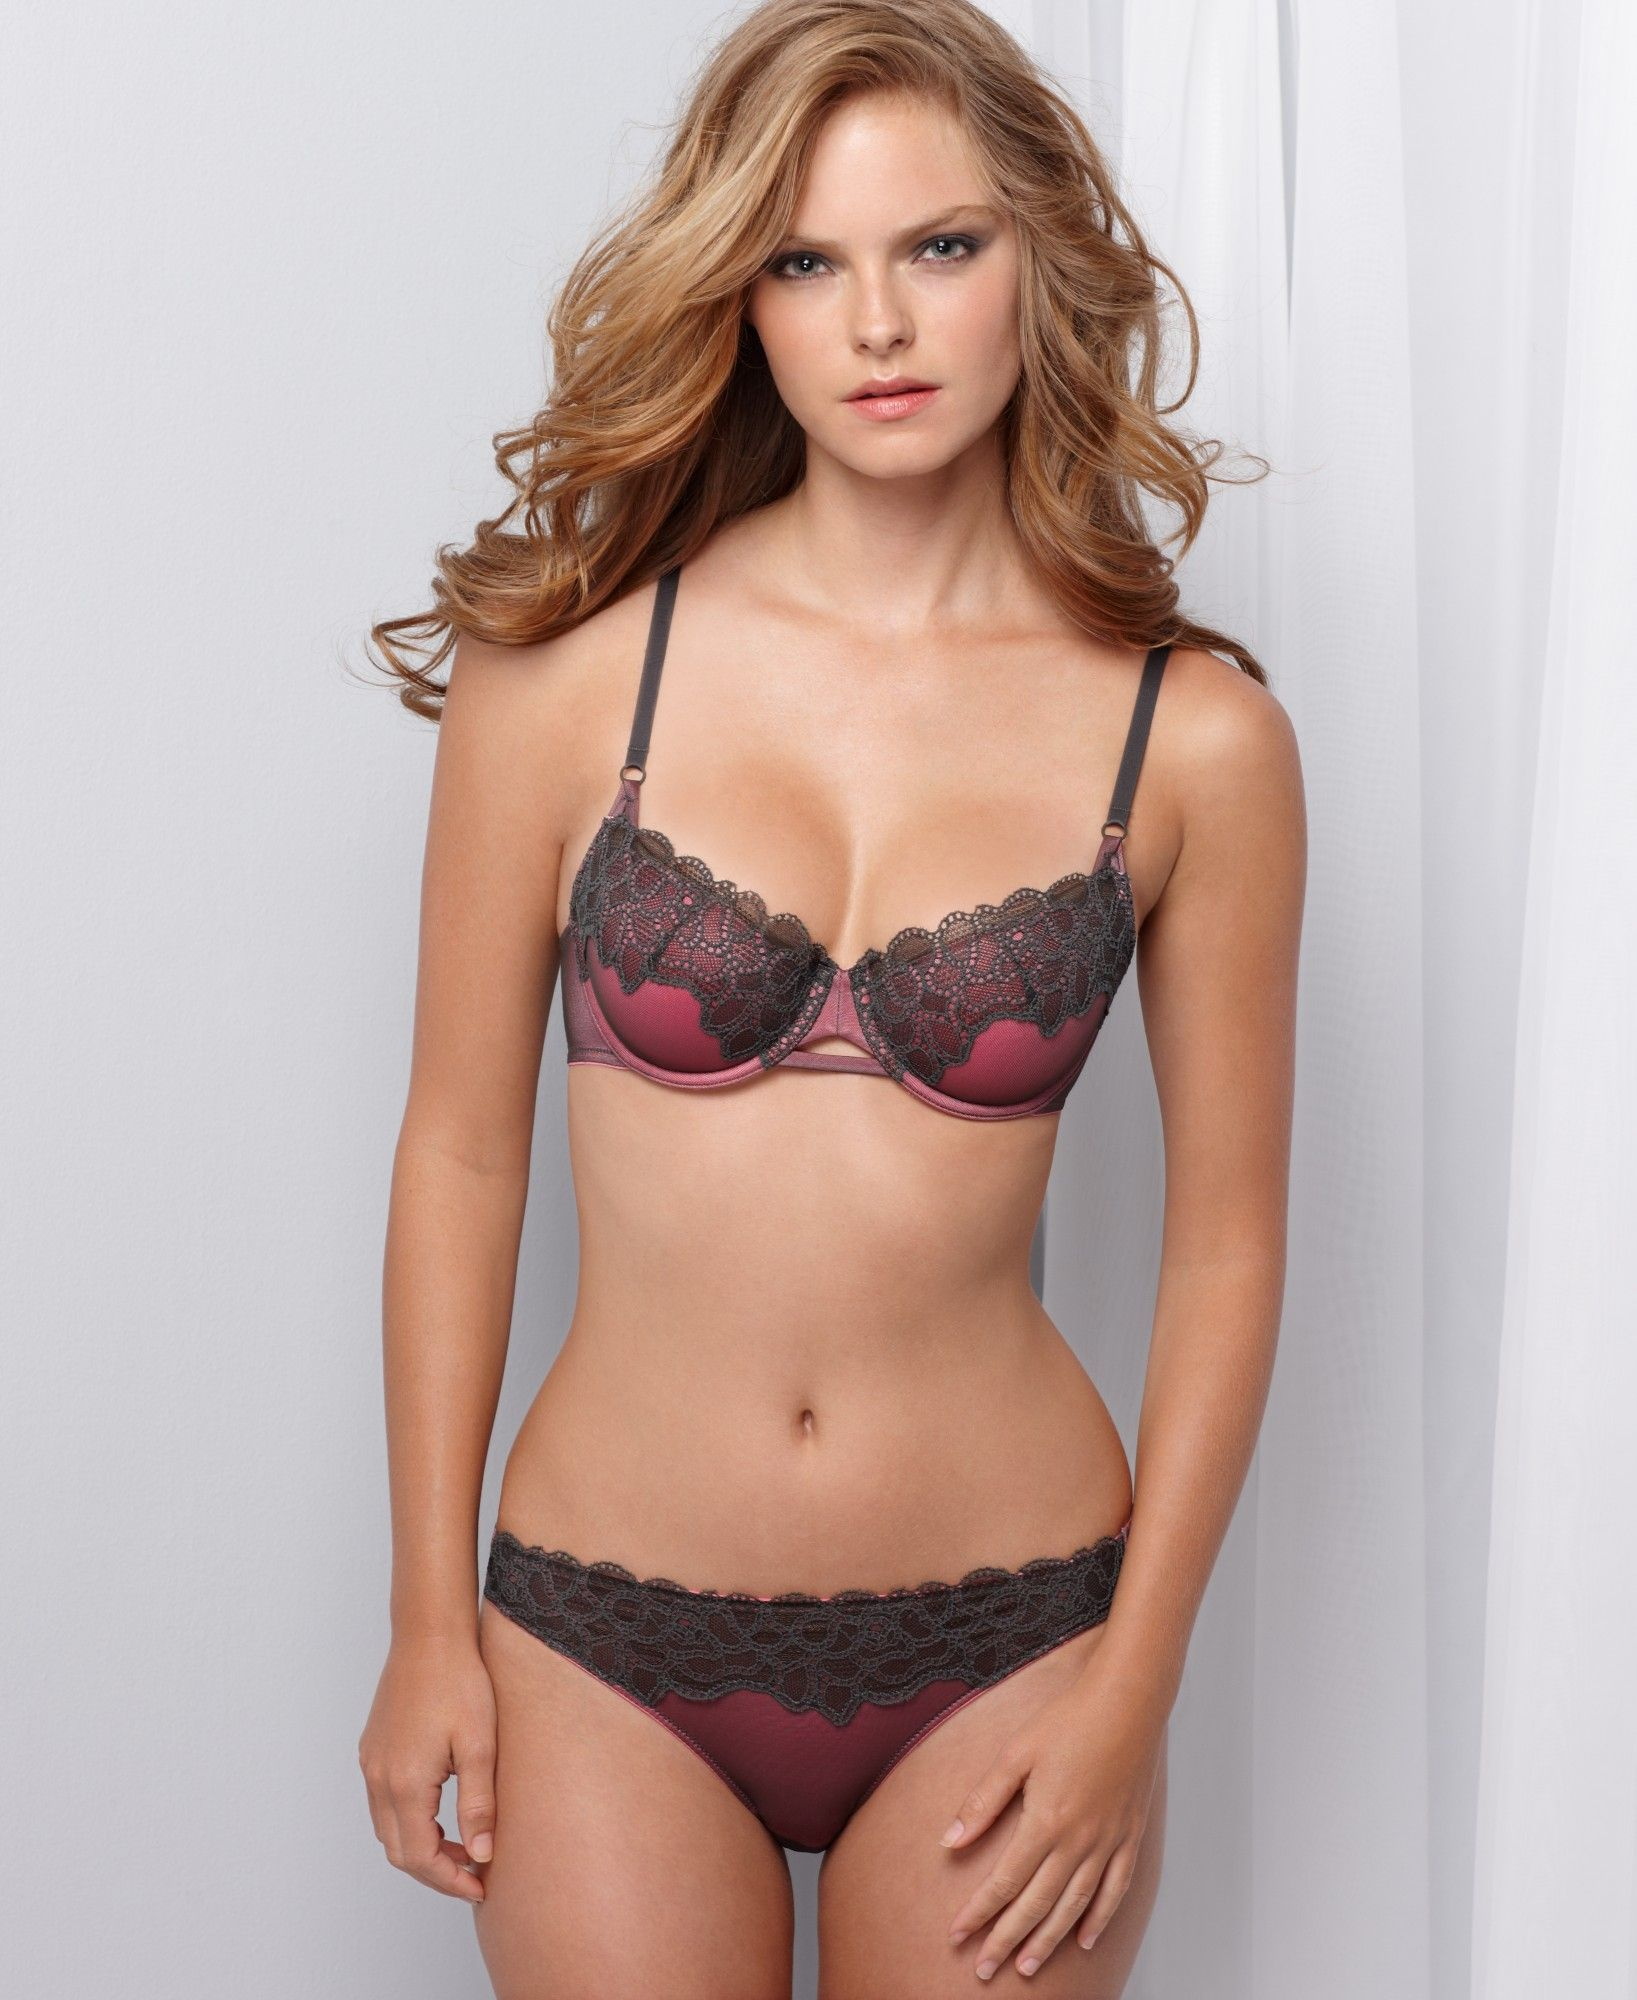 Jessica_Perez_13.jpg   Models Rating